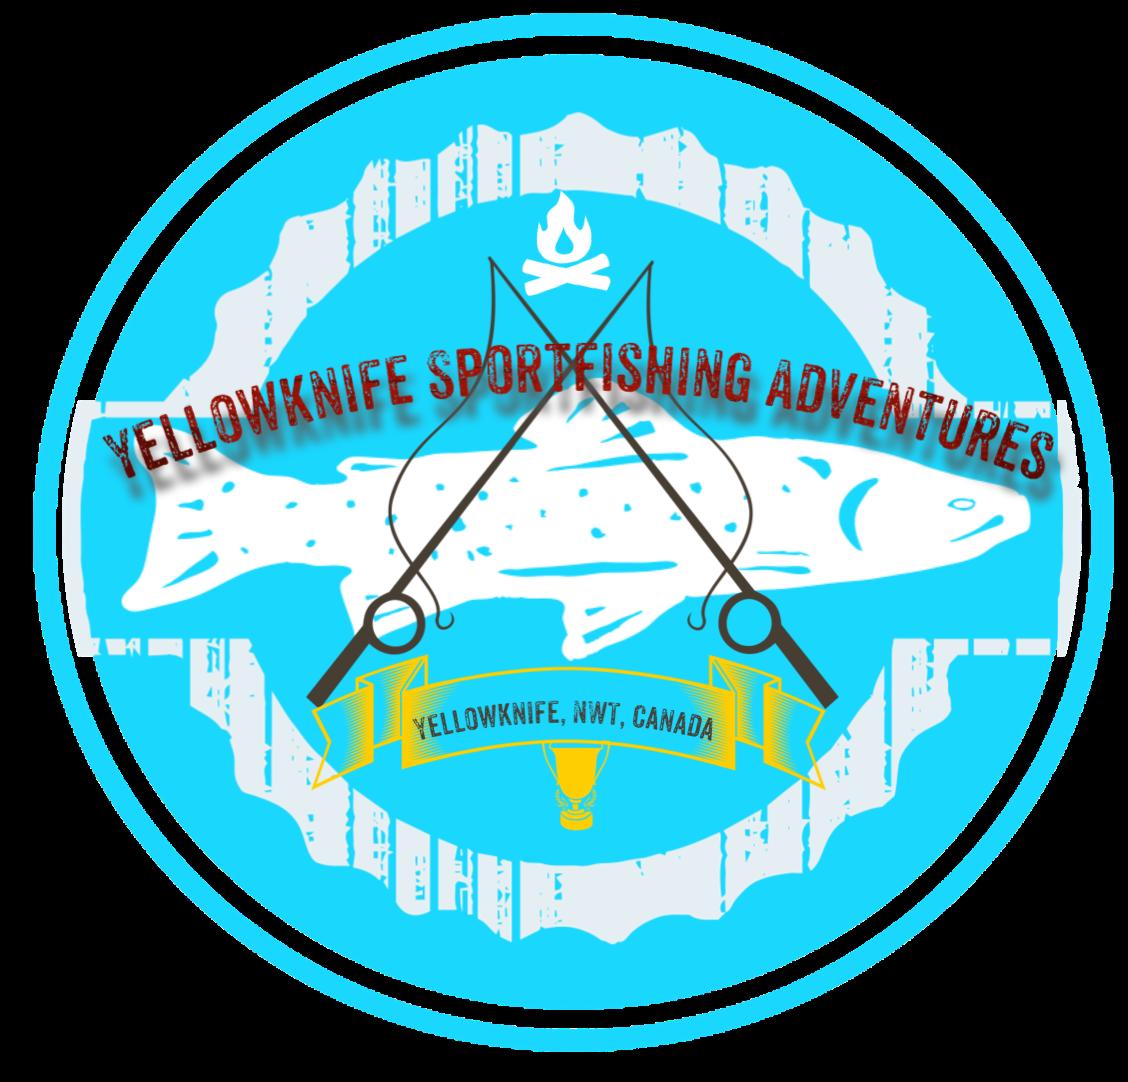 Yellowknife Fishing Charter - Yellowknife Sportfishing Adventures